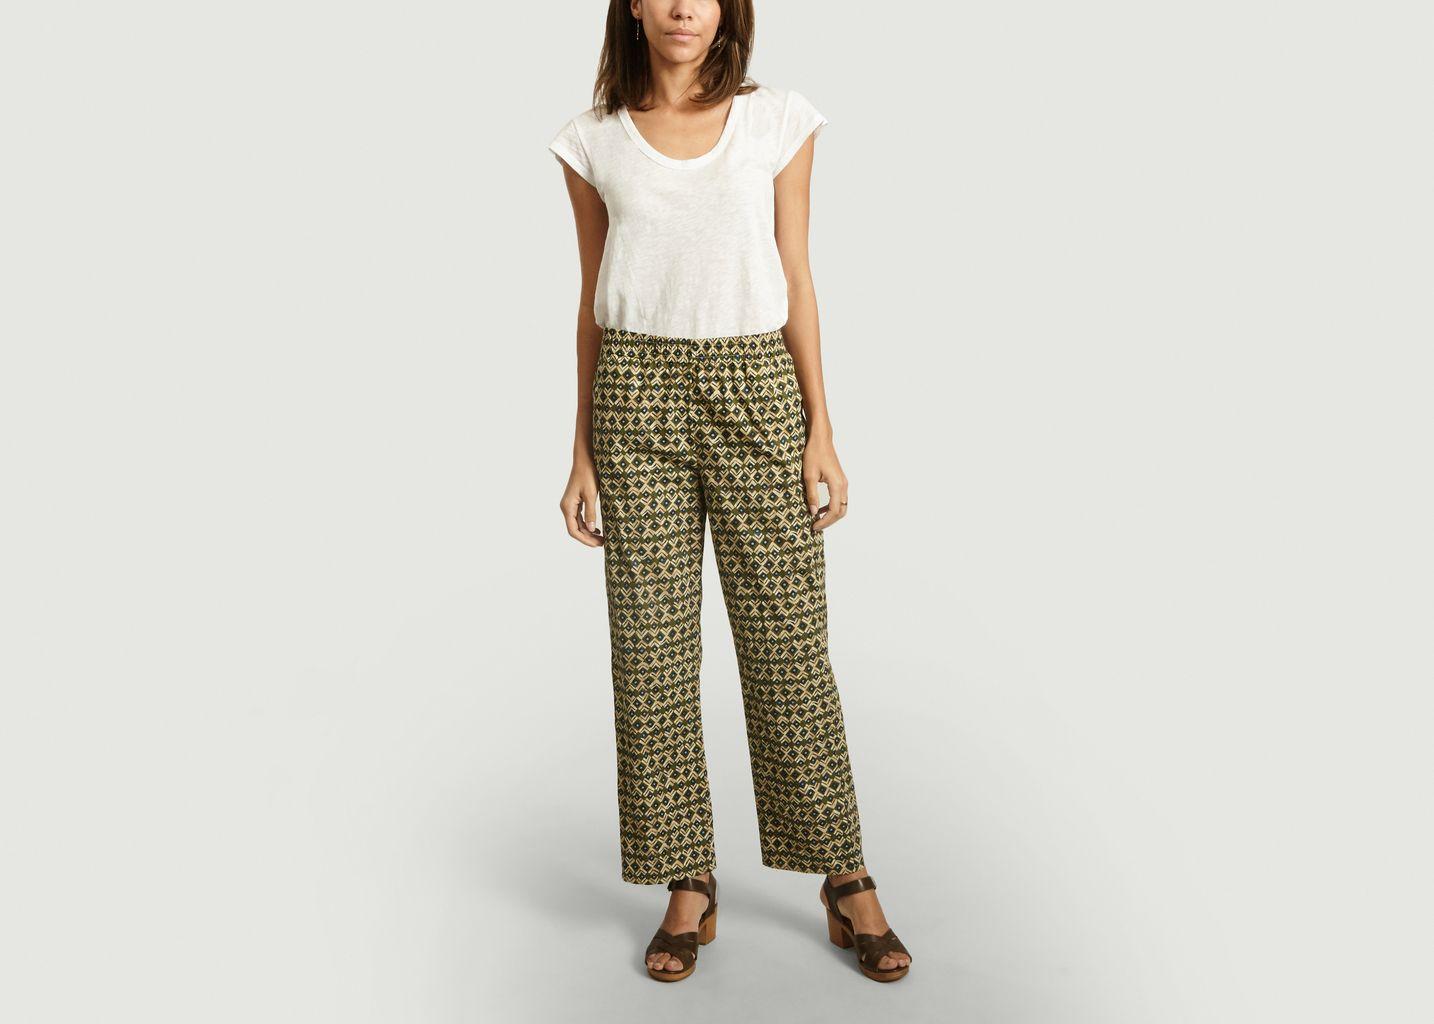 Pantalon Prunelle - Hartford